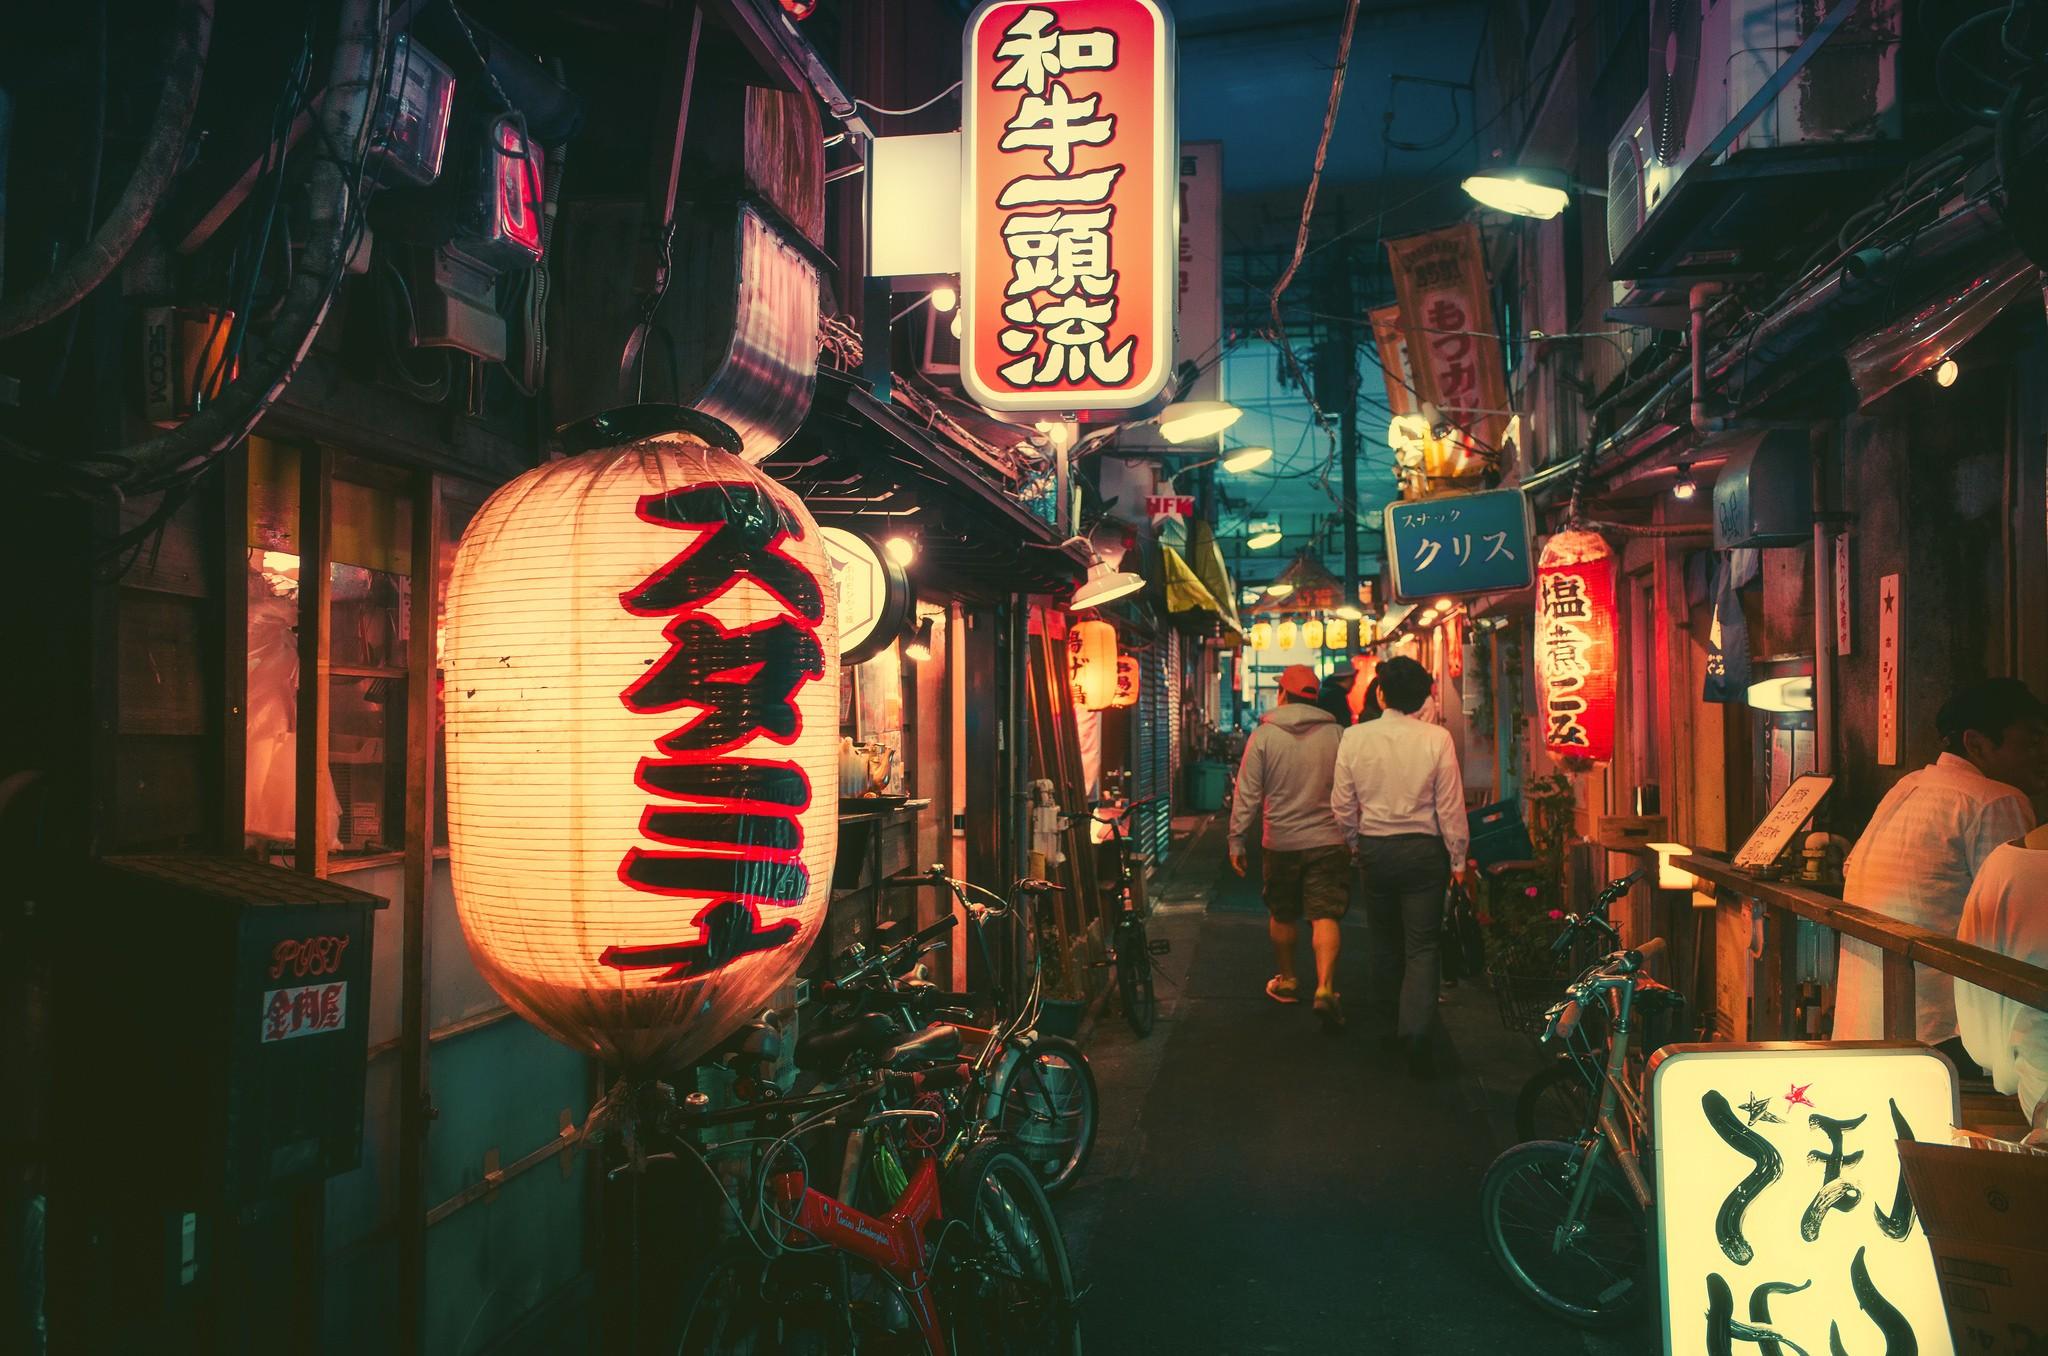 General 2048x1356 Japan night town city